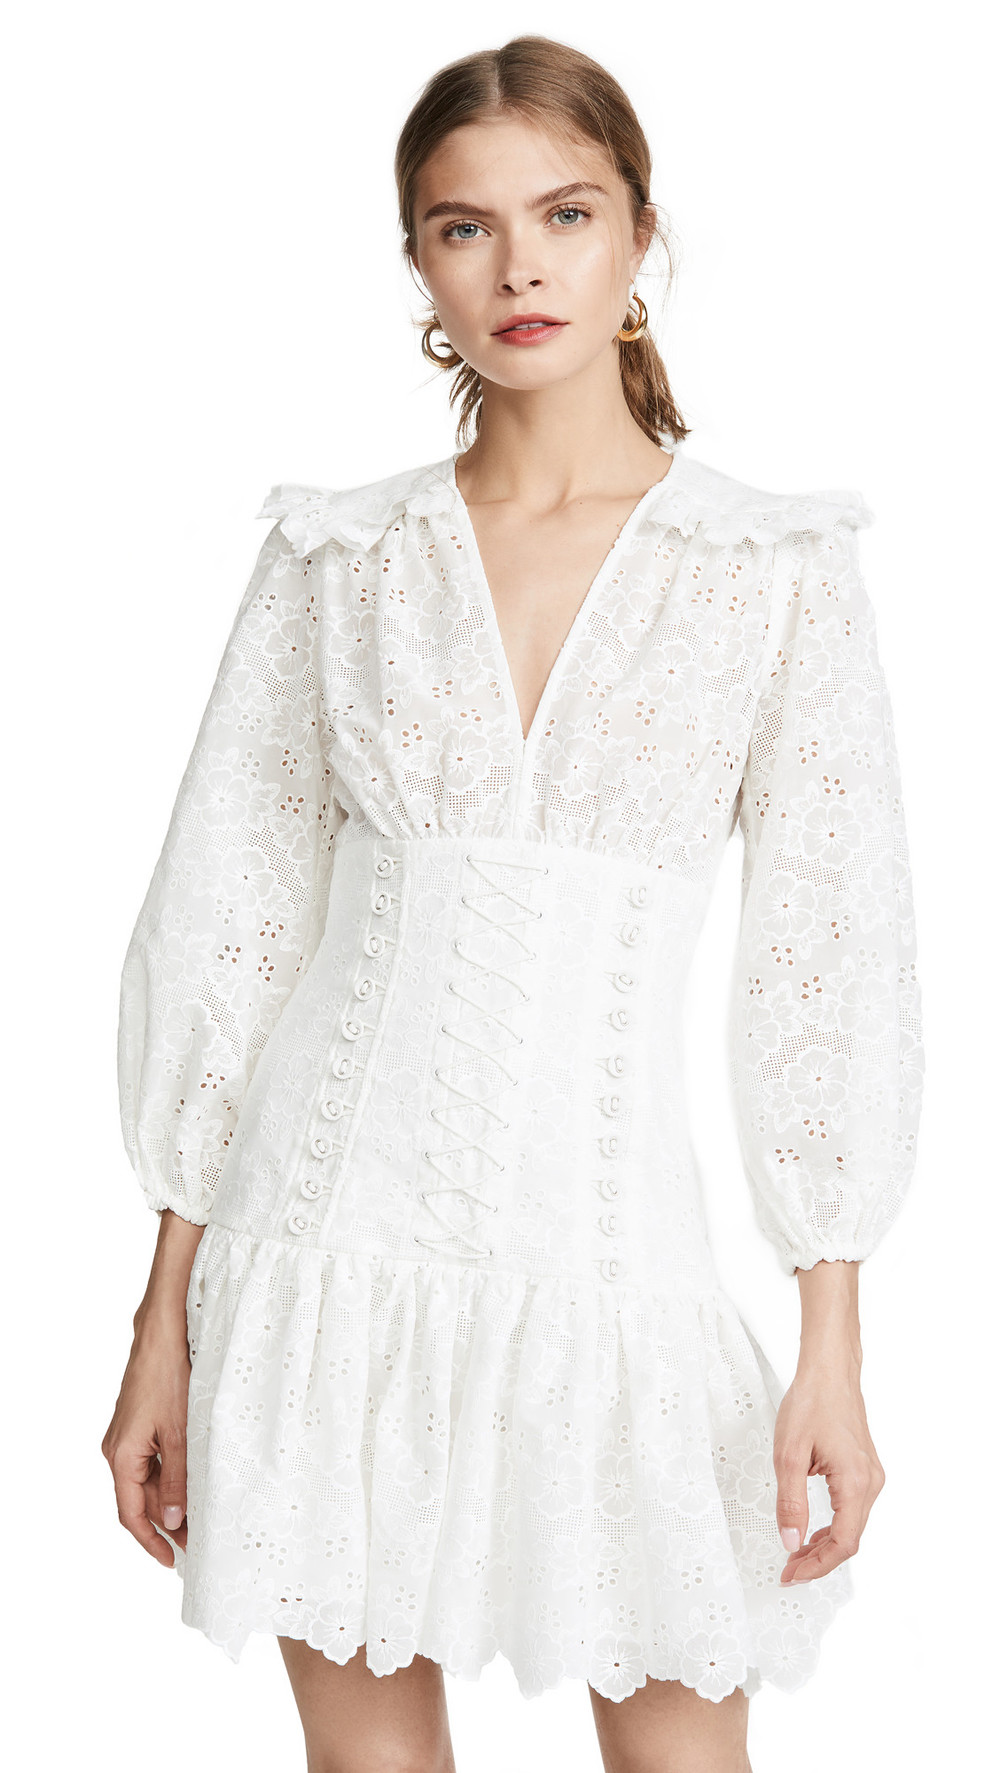 Zimmermann Honour Corset Lace Dress in ivory